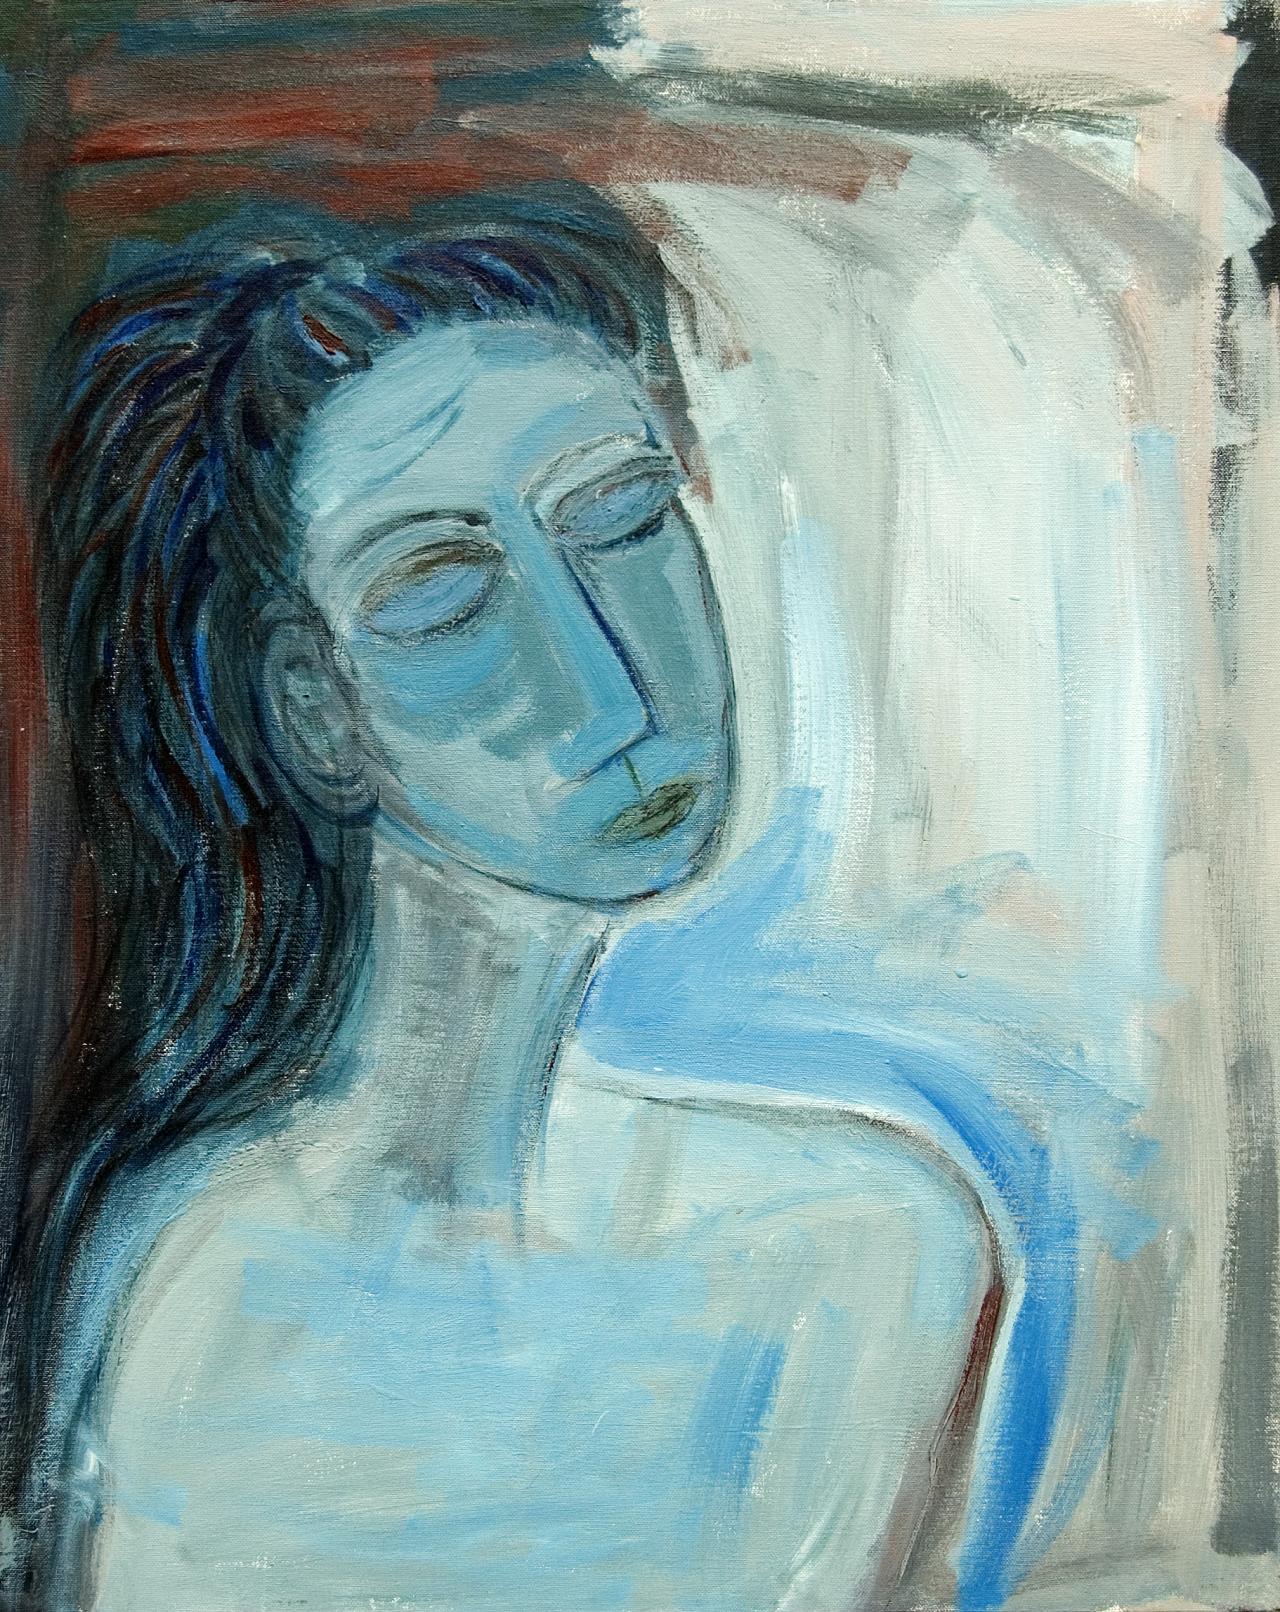 Blue_Woman_Gholson.26731734_large.jpg